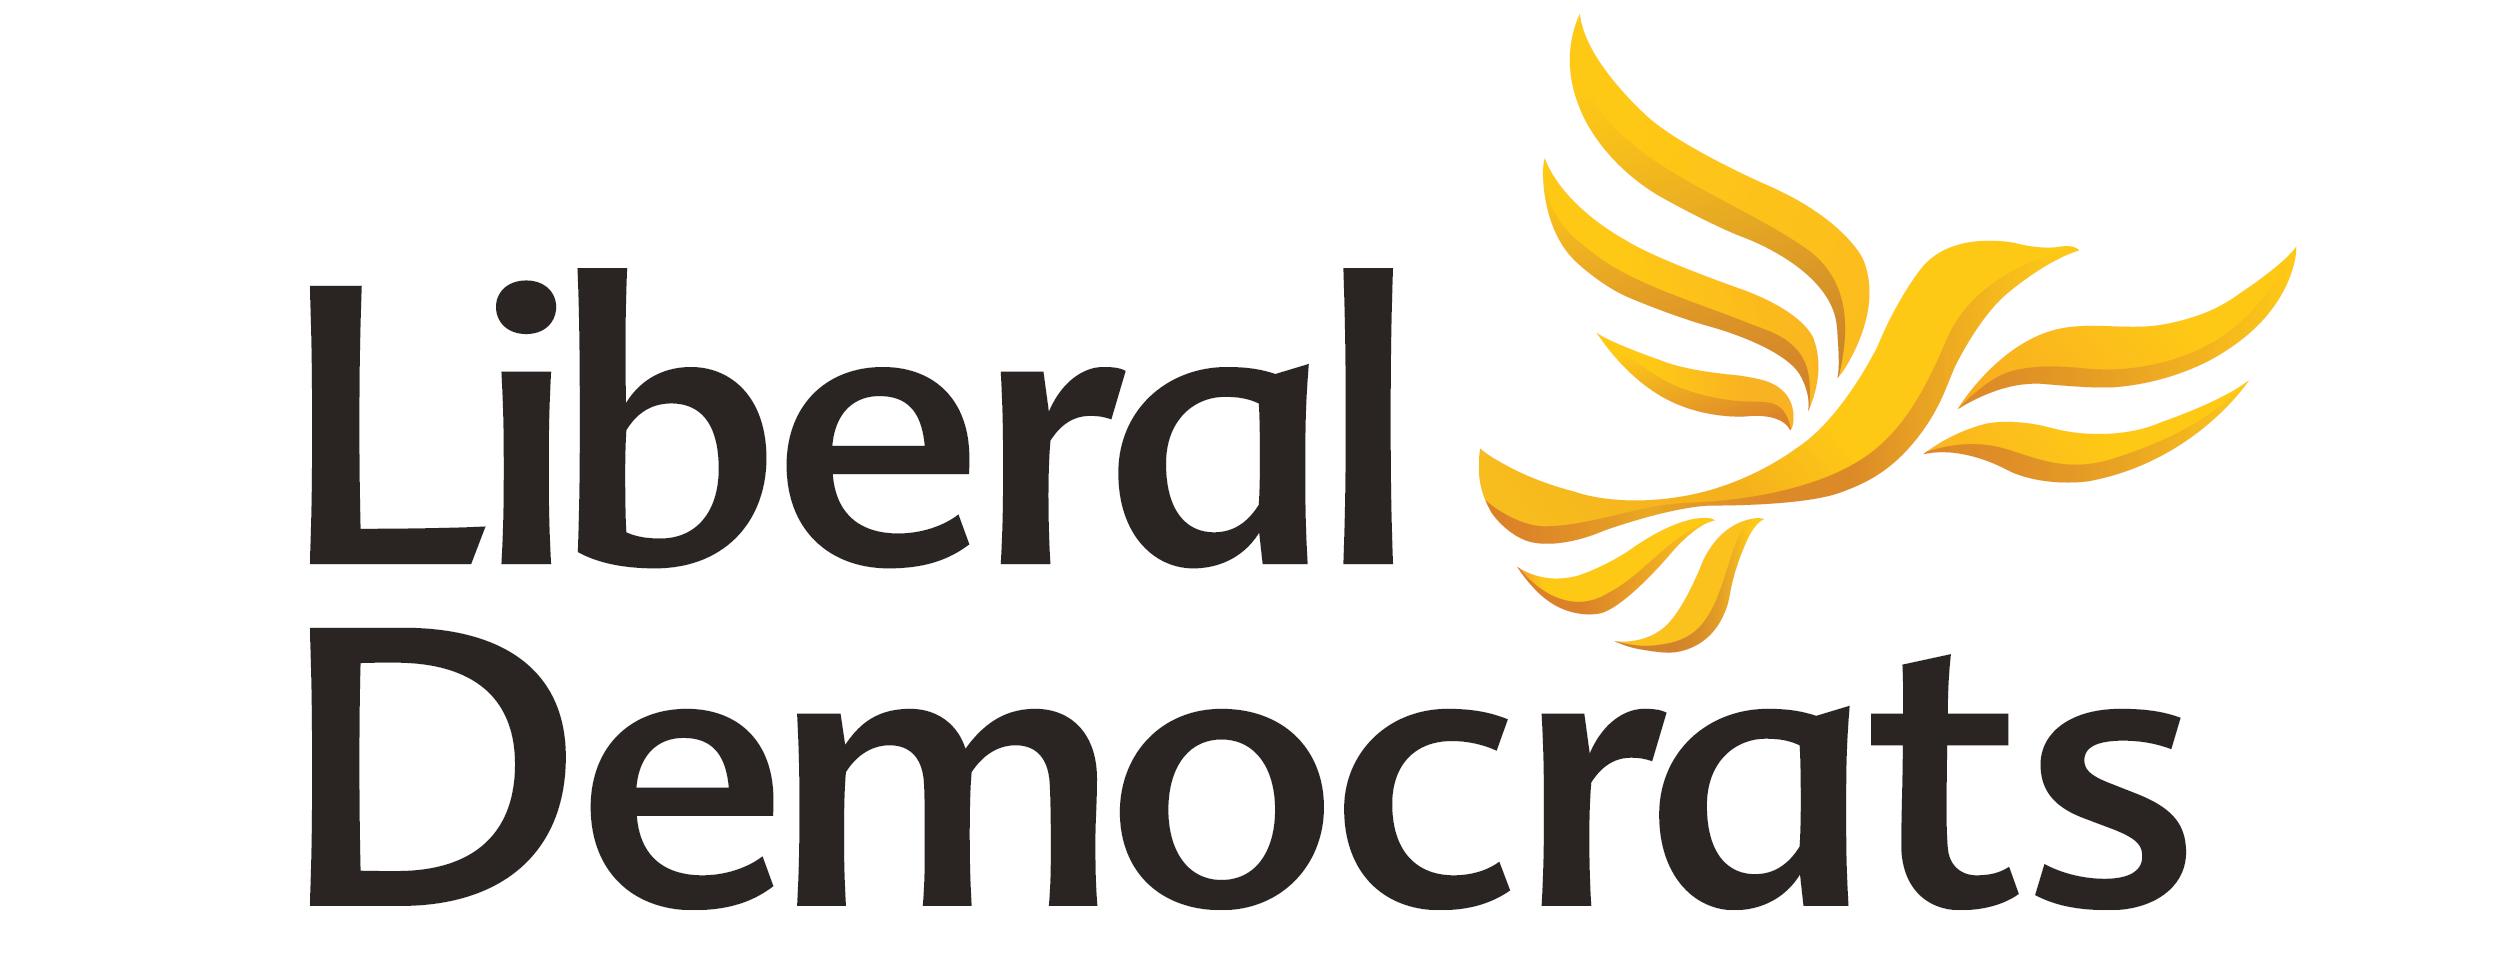 North East Derbyshire & Bolsover District Liberal Democrats